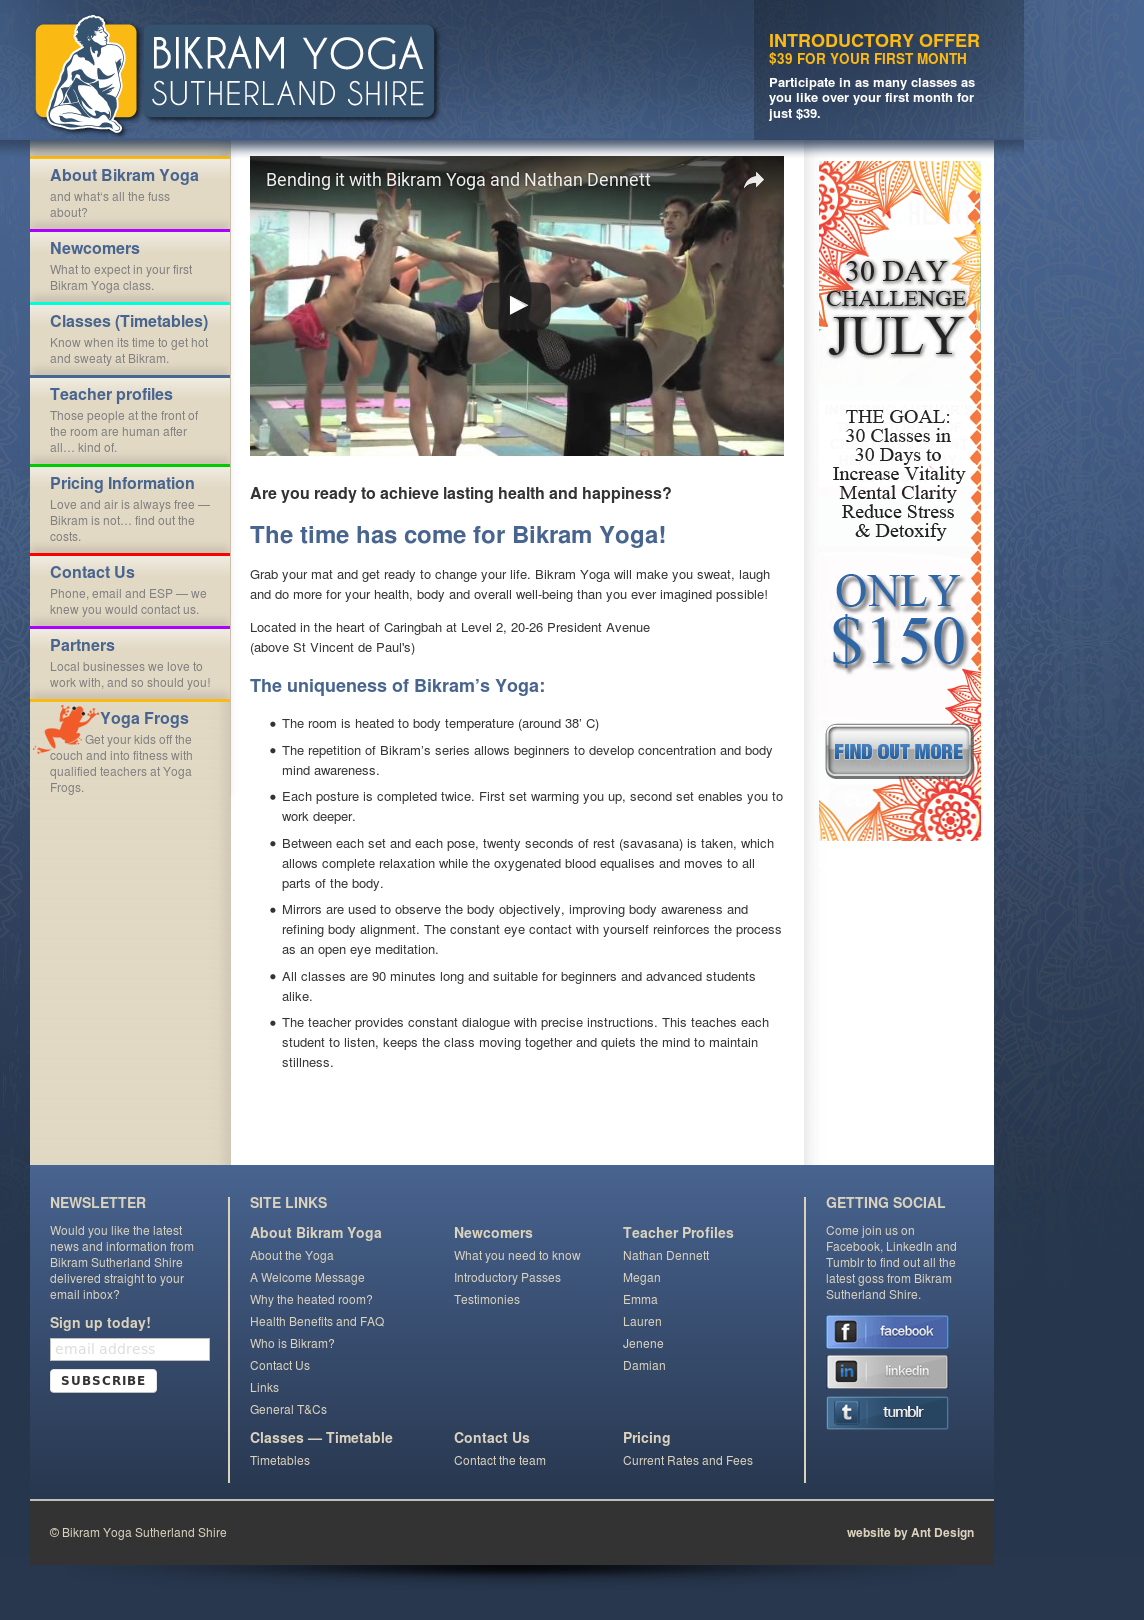 Hot Wife Challenge Tumblr bikram yoga sutherland shire competitors, revenue and